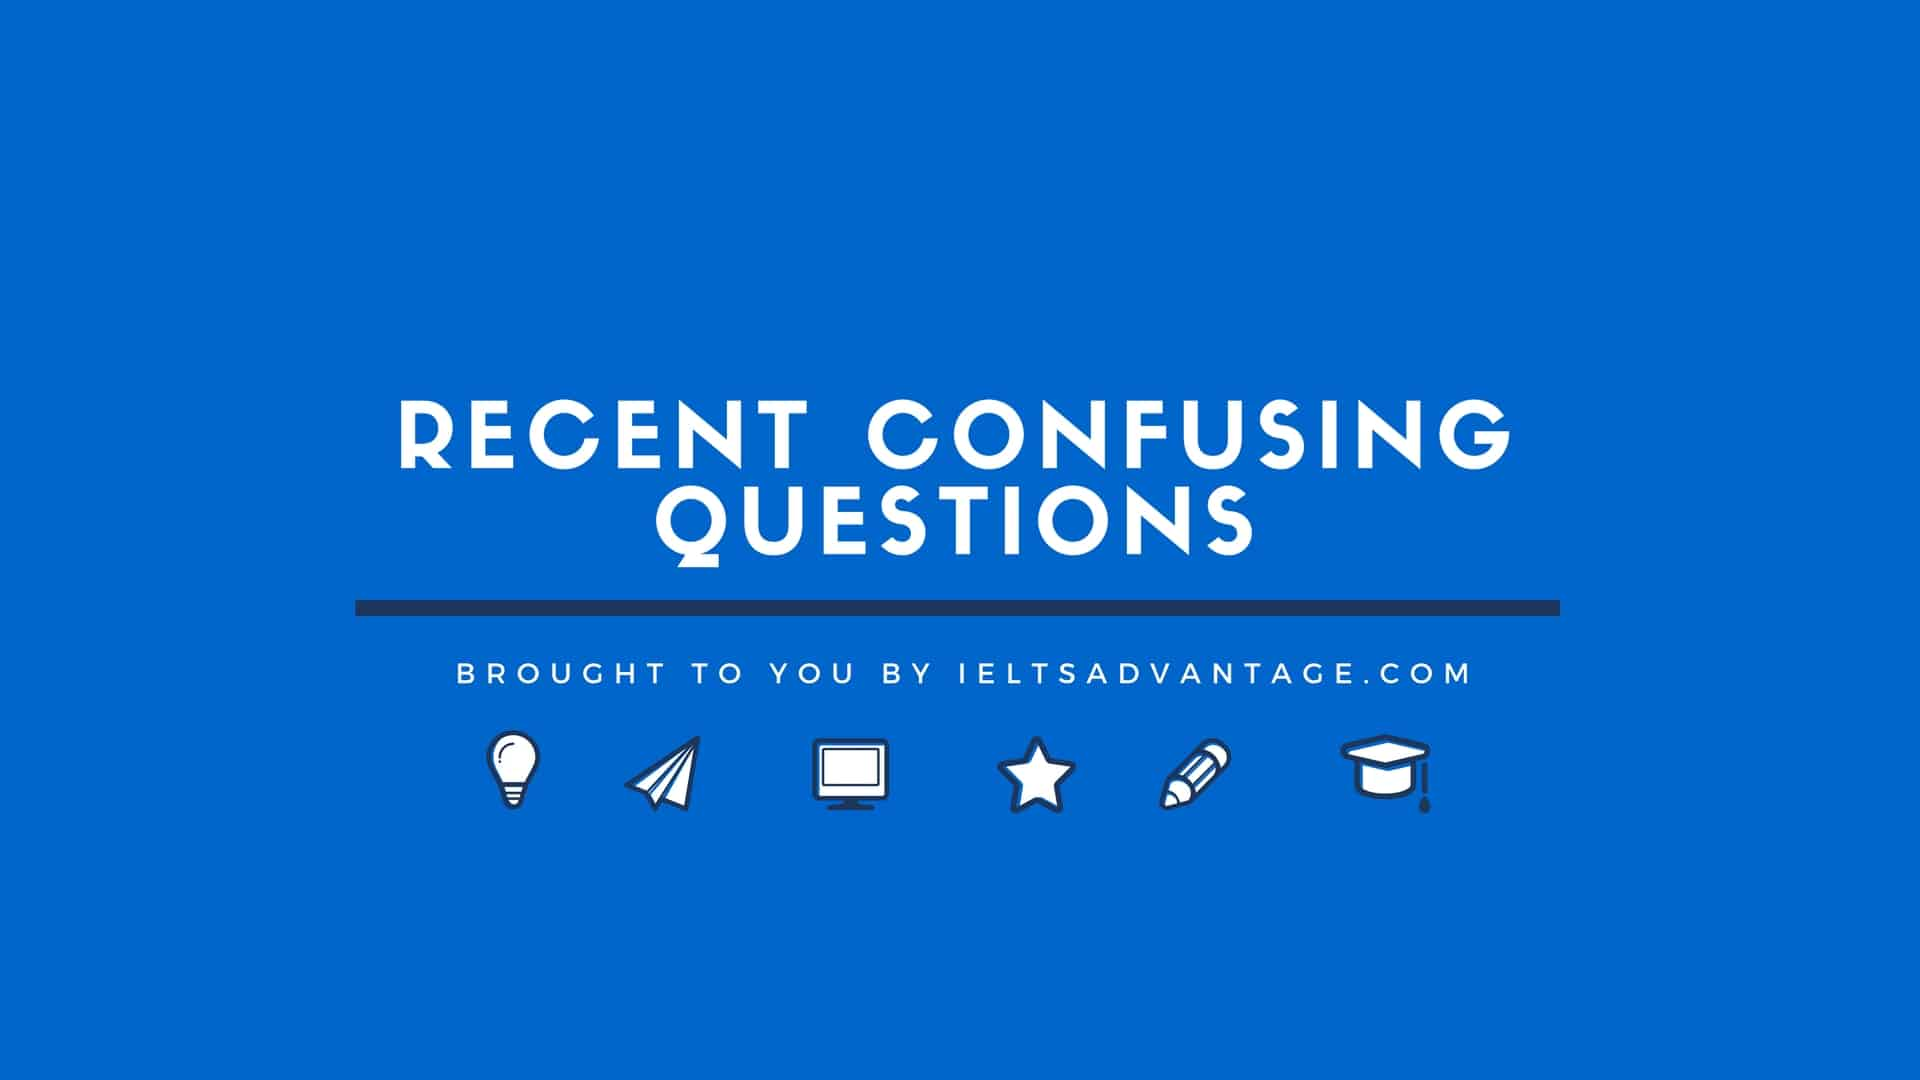 Recent Confusing Questions